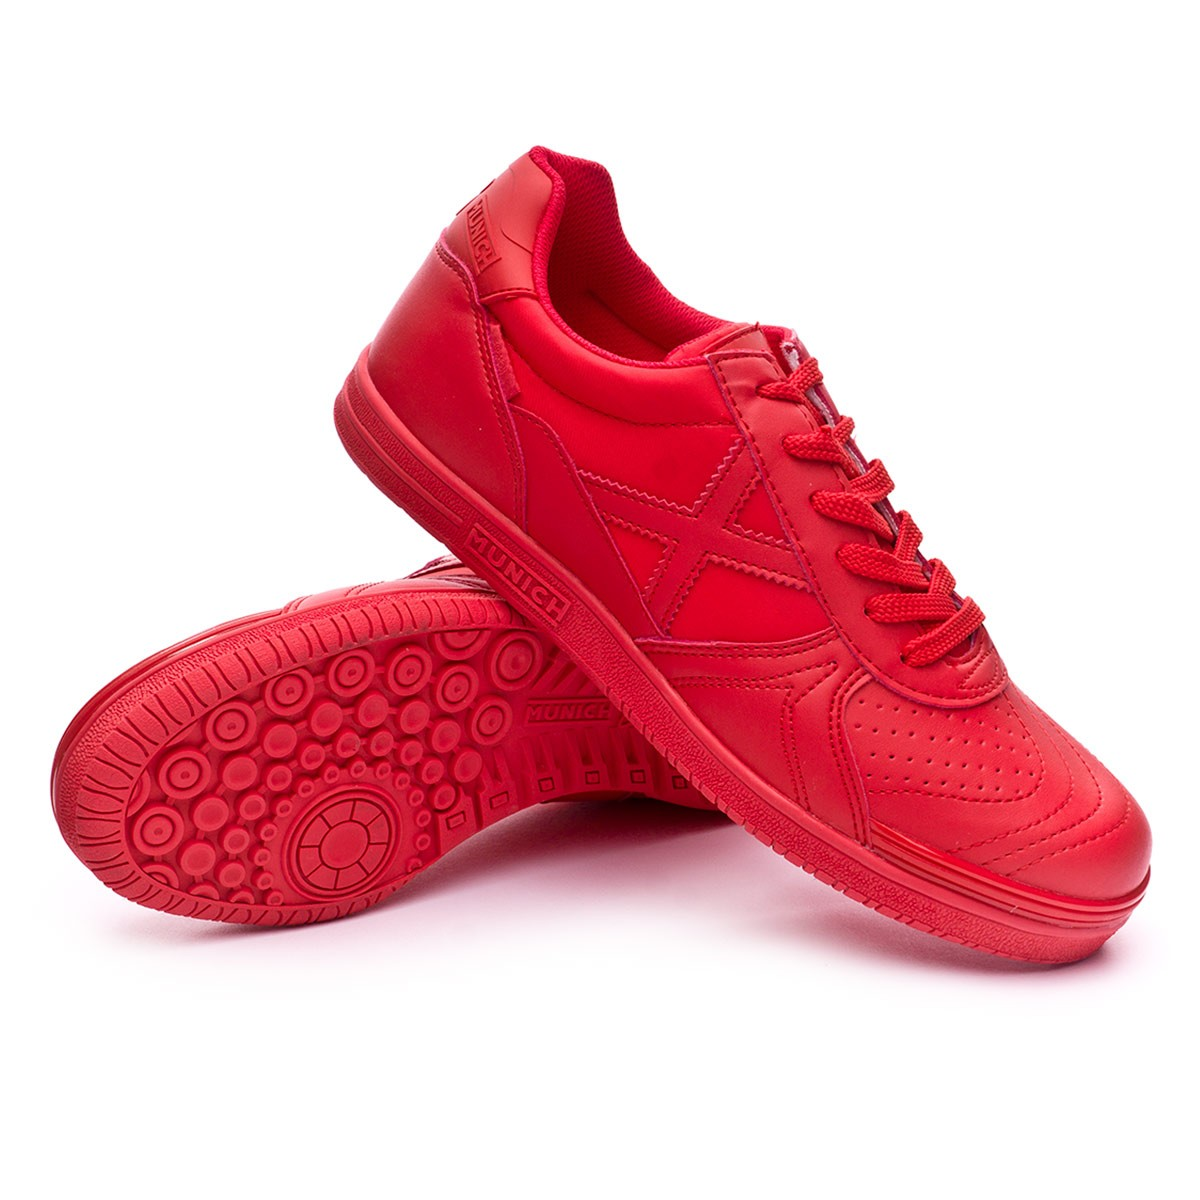 Futsal Boot Munich G3 Monochrome Red - Soloporteros es ahora Fútbol ... c2d2938b7